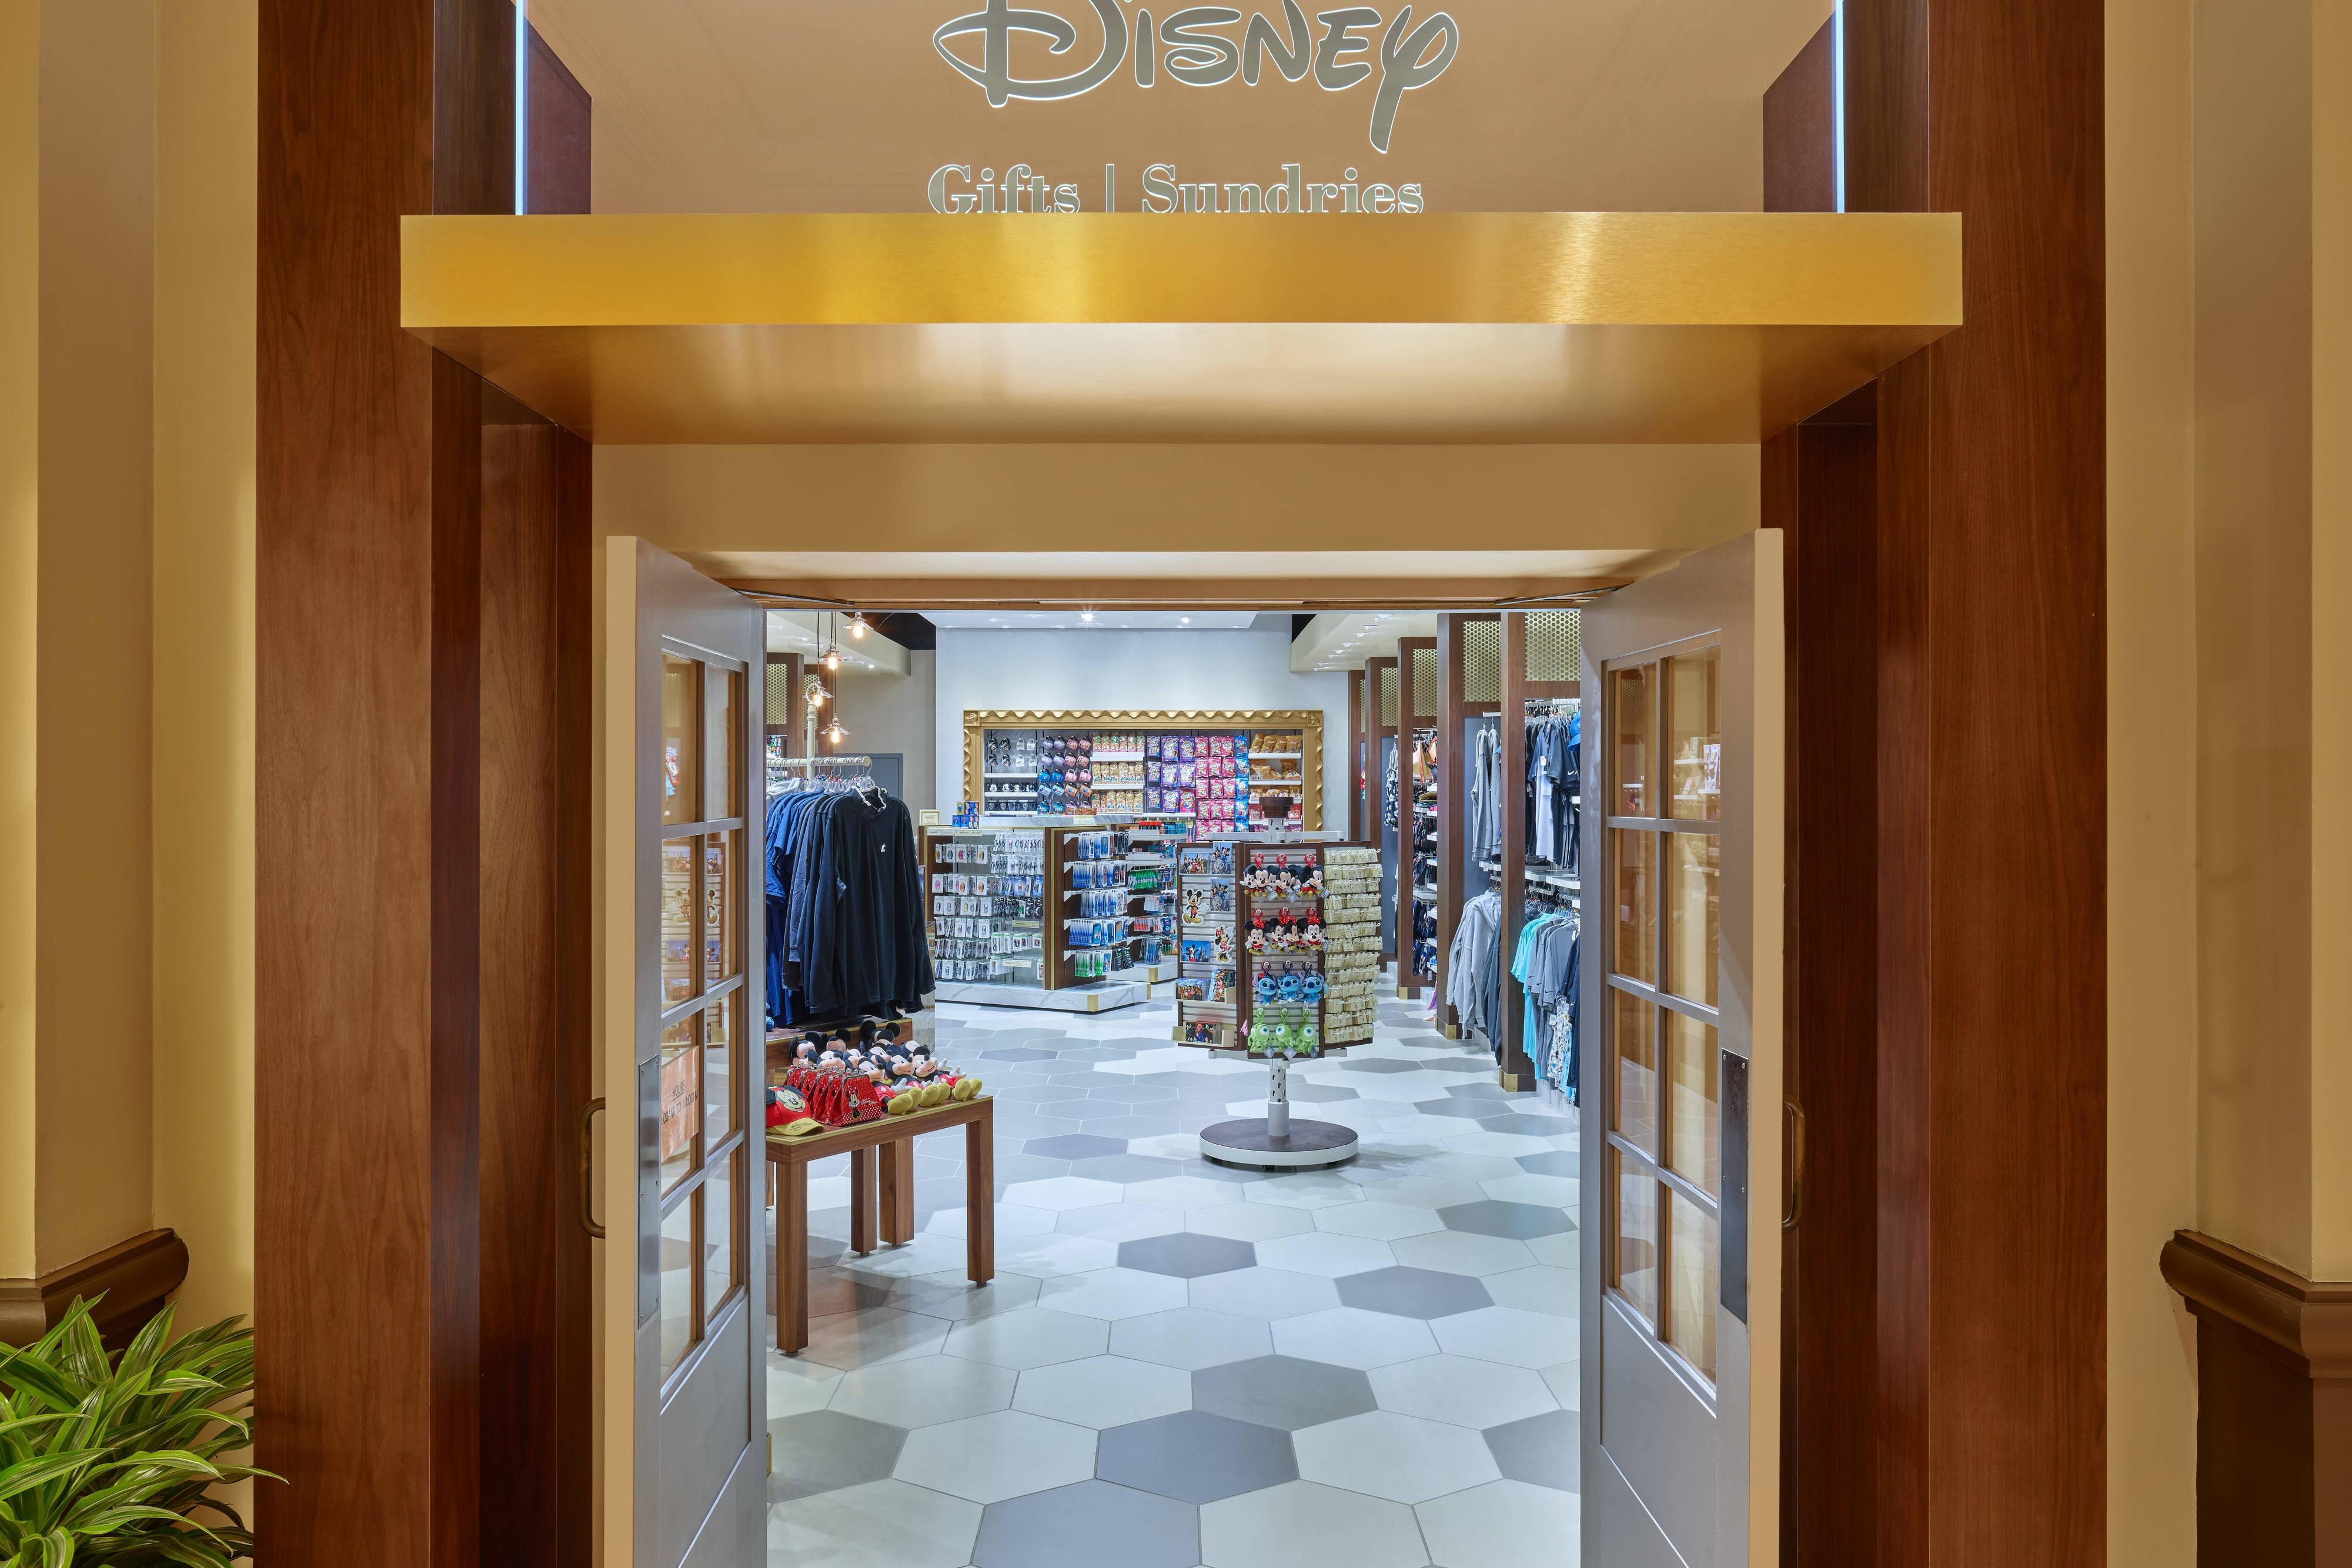 Disney Retail Store